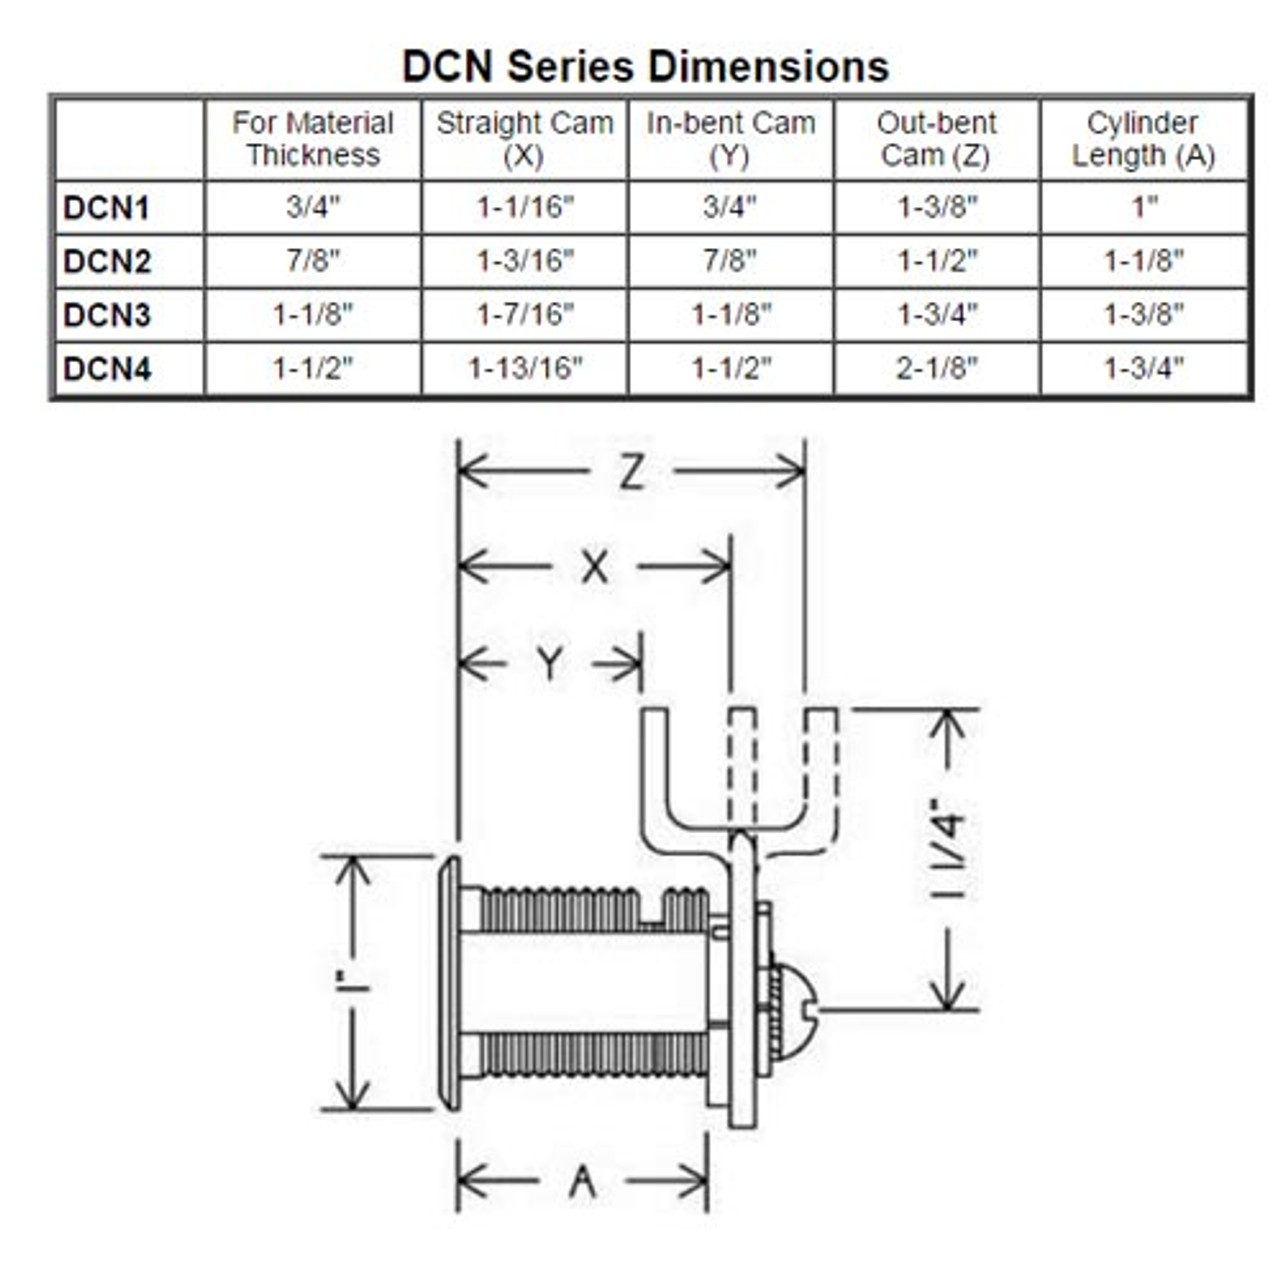 Olympus DCN1-KA101-26D N Series Keyed Alike Reversible Cam Lock in Satin Chrome